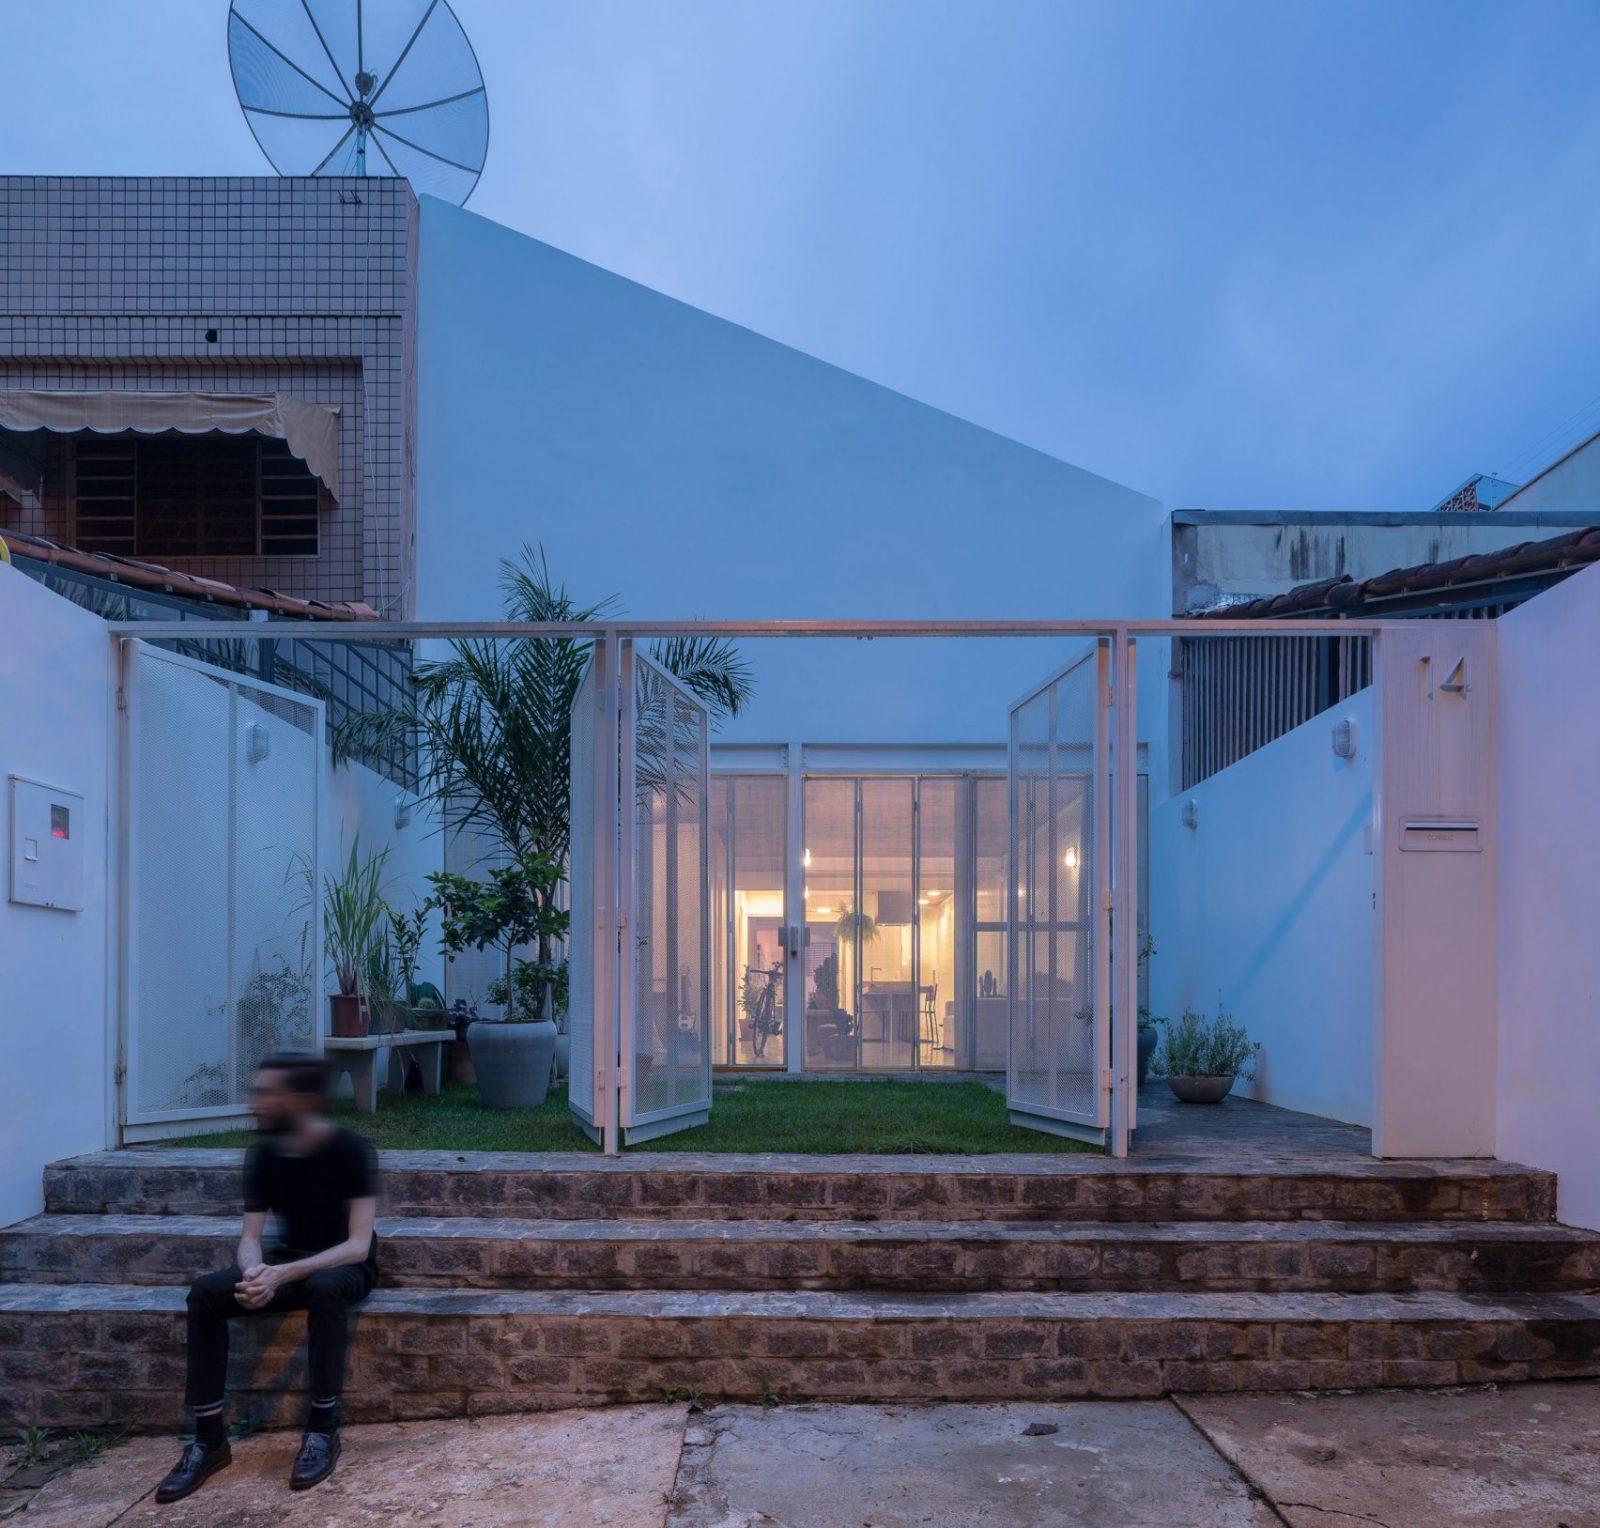 casa-711h-bloco-arquitetos-Joana-Franca-05jpg-1600x1528